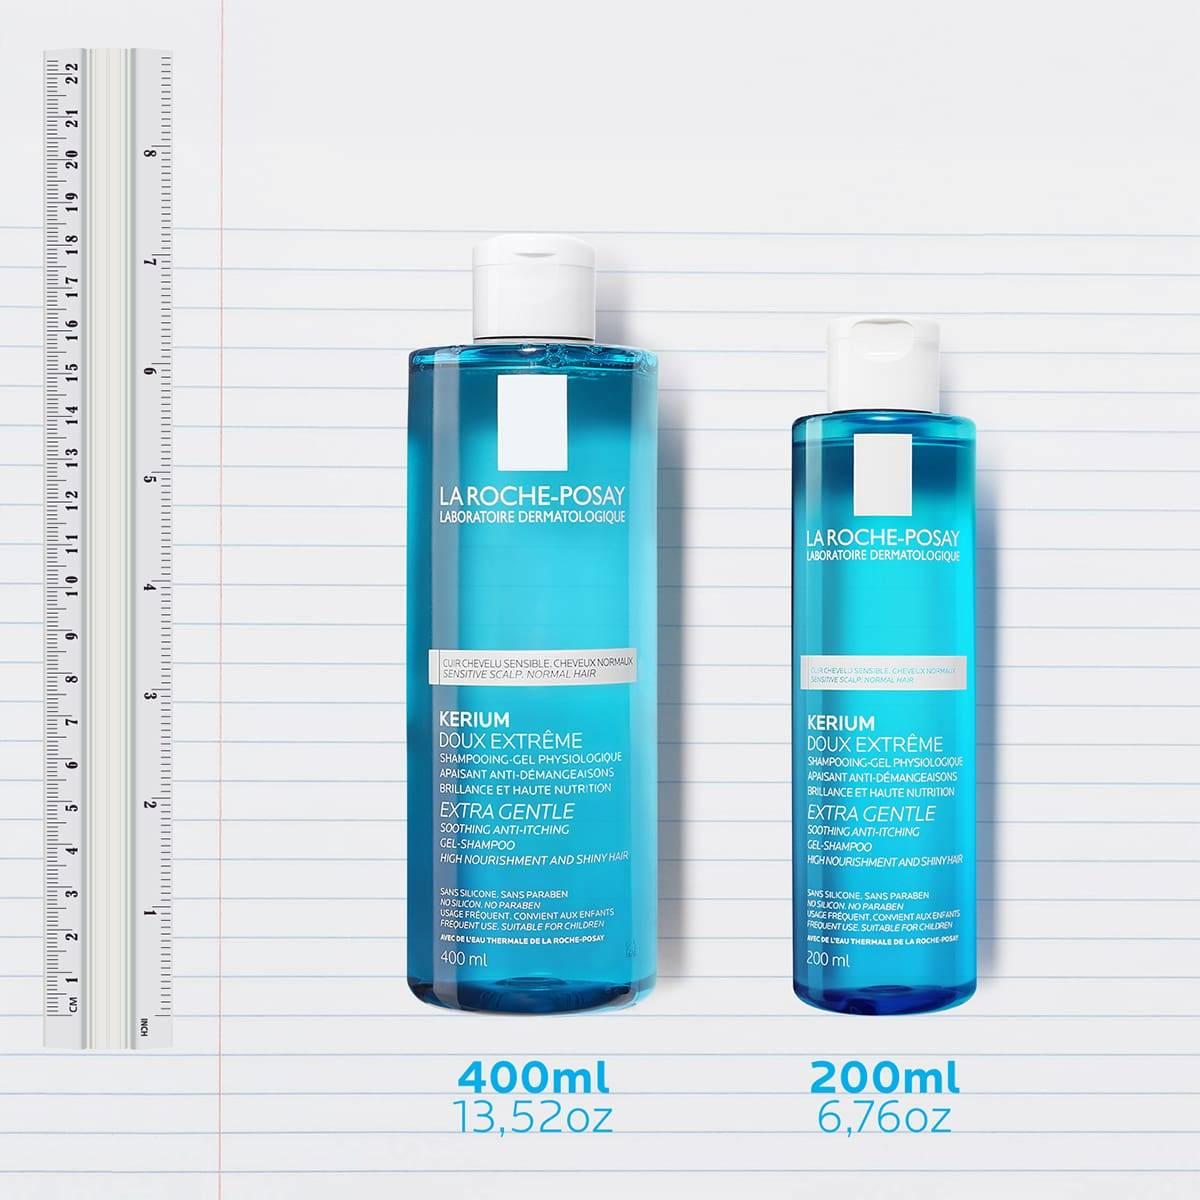 La Roche Posay ProductPage Kerium Extra Gentle Gel Shampoo Family 3337